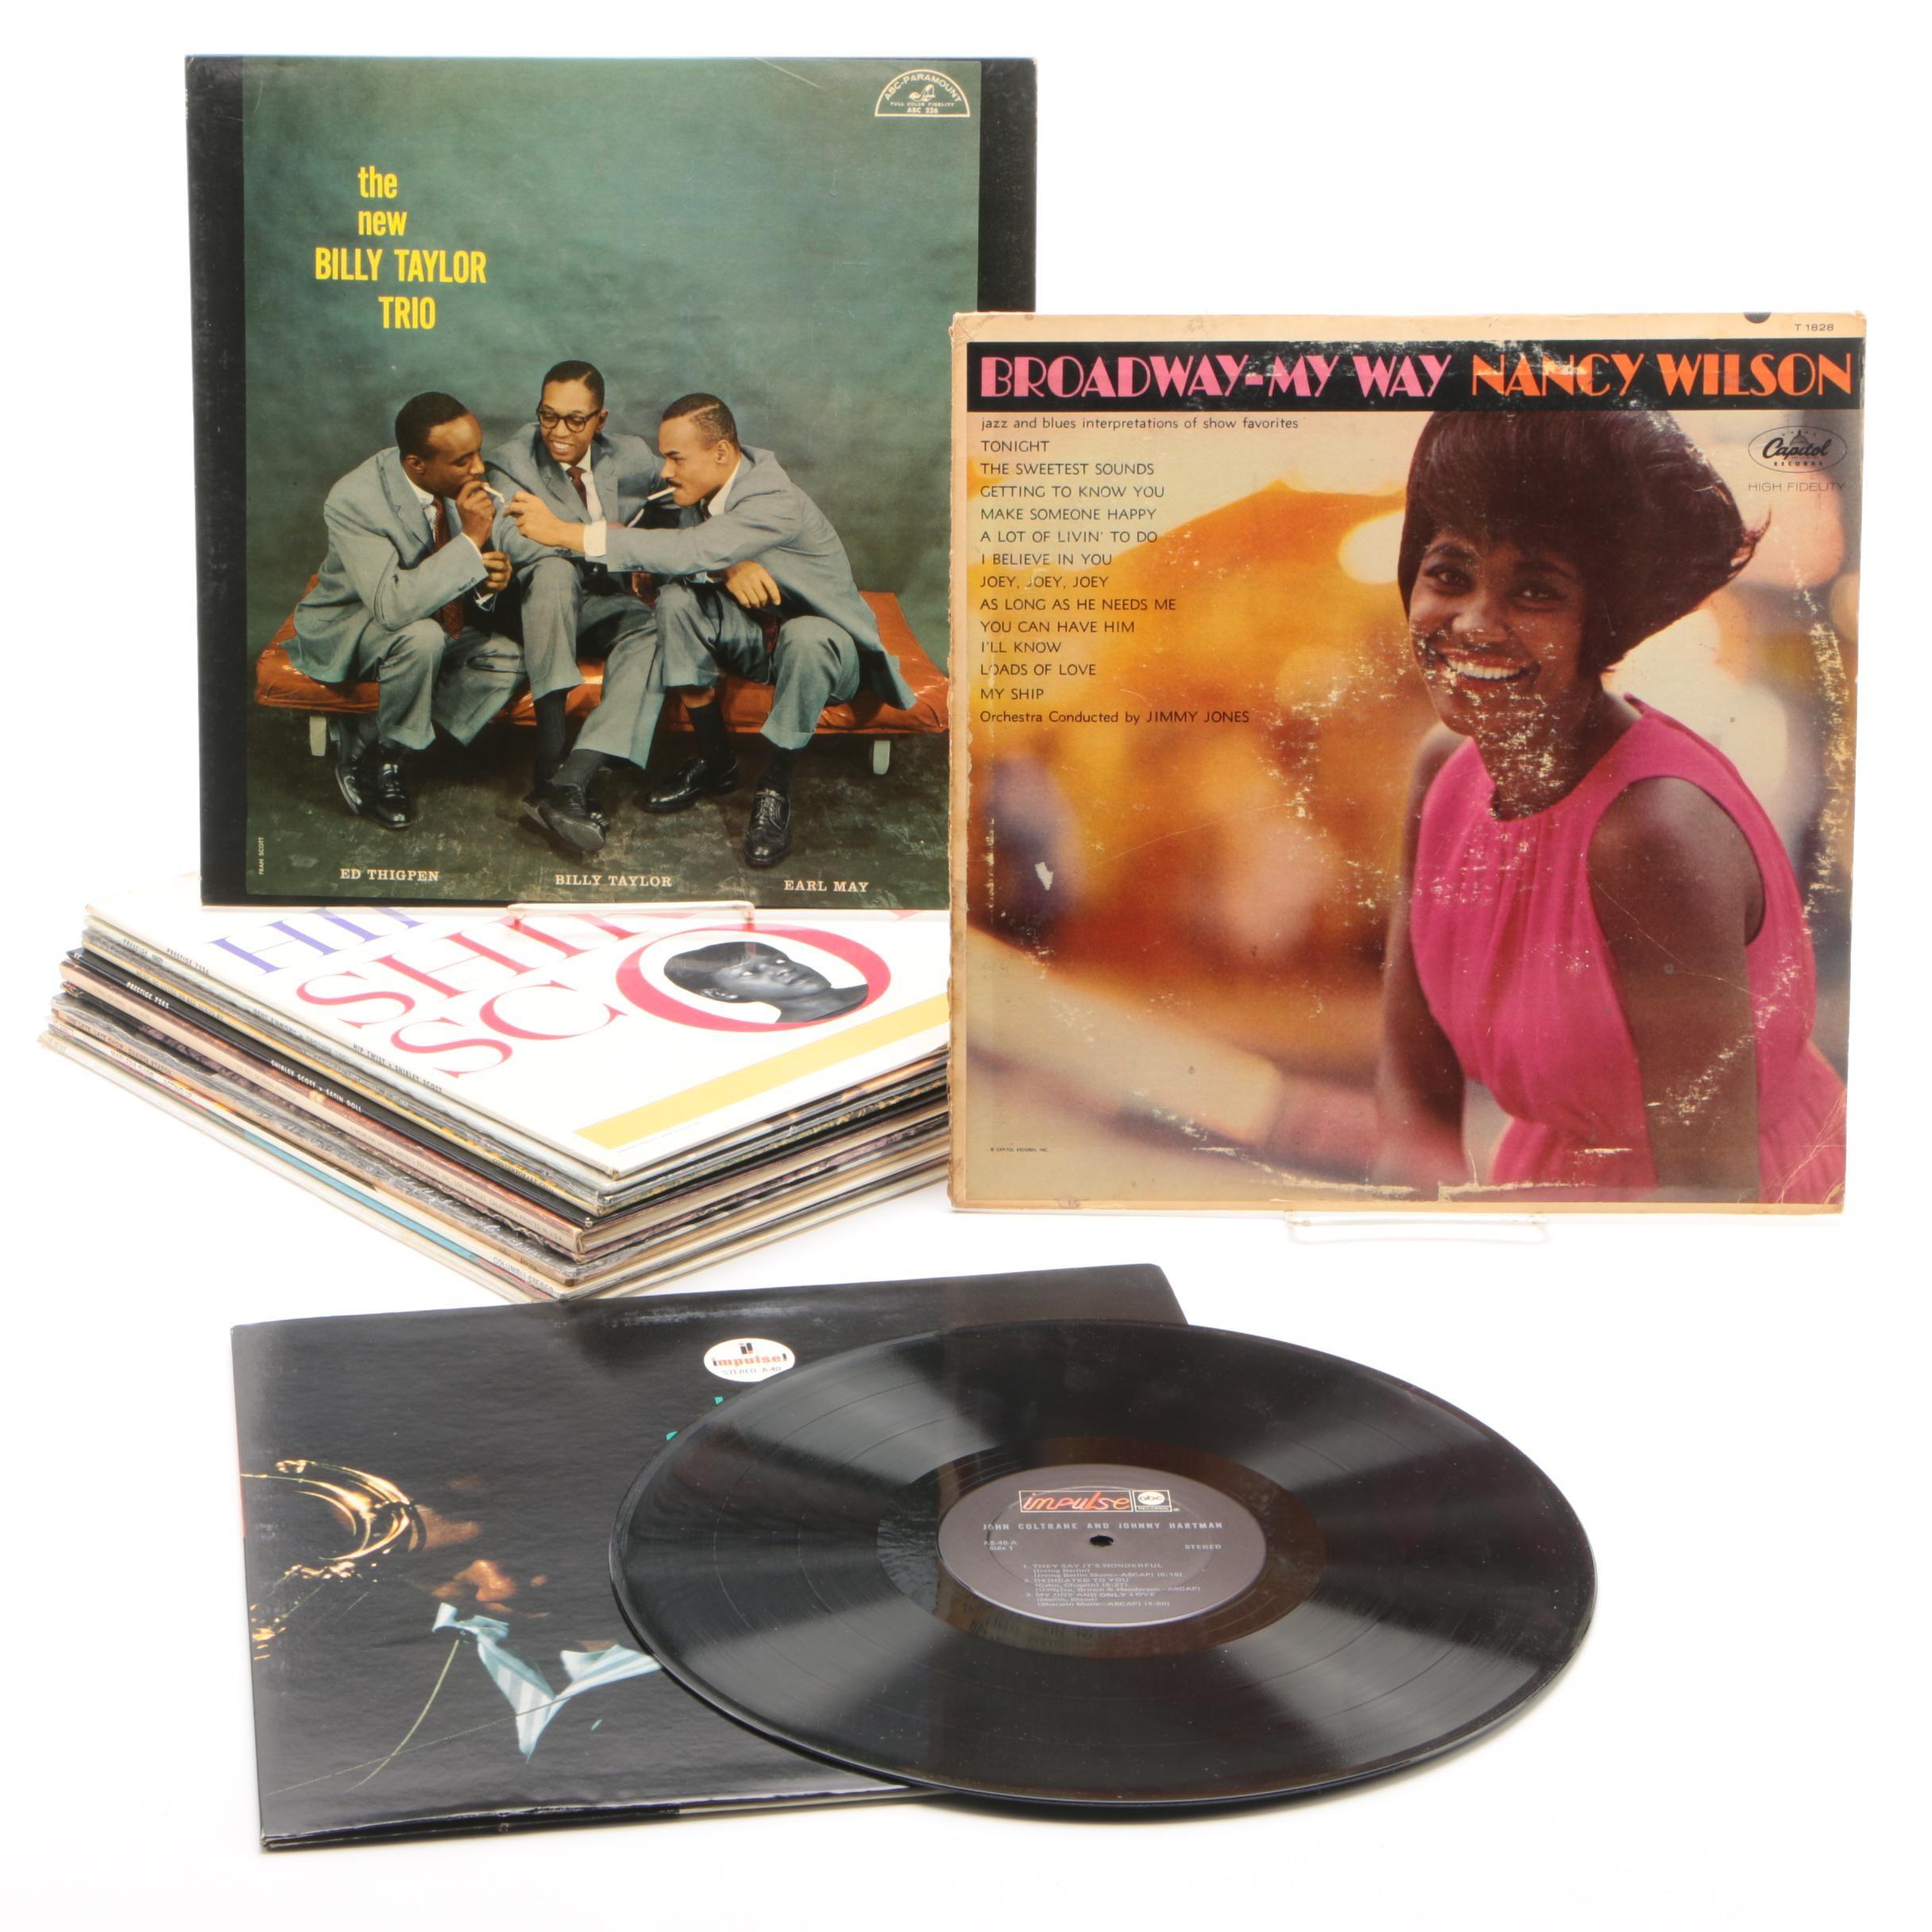 Jazz Vinyl Records From Herbie Hancock, Nancy Wilson, John Coltrane, and More